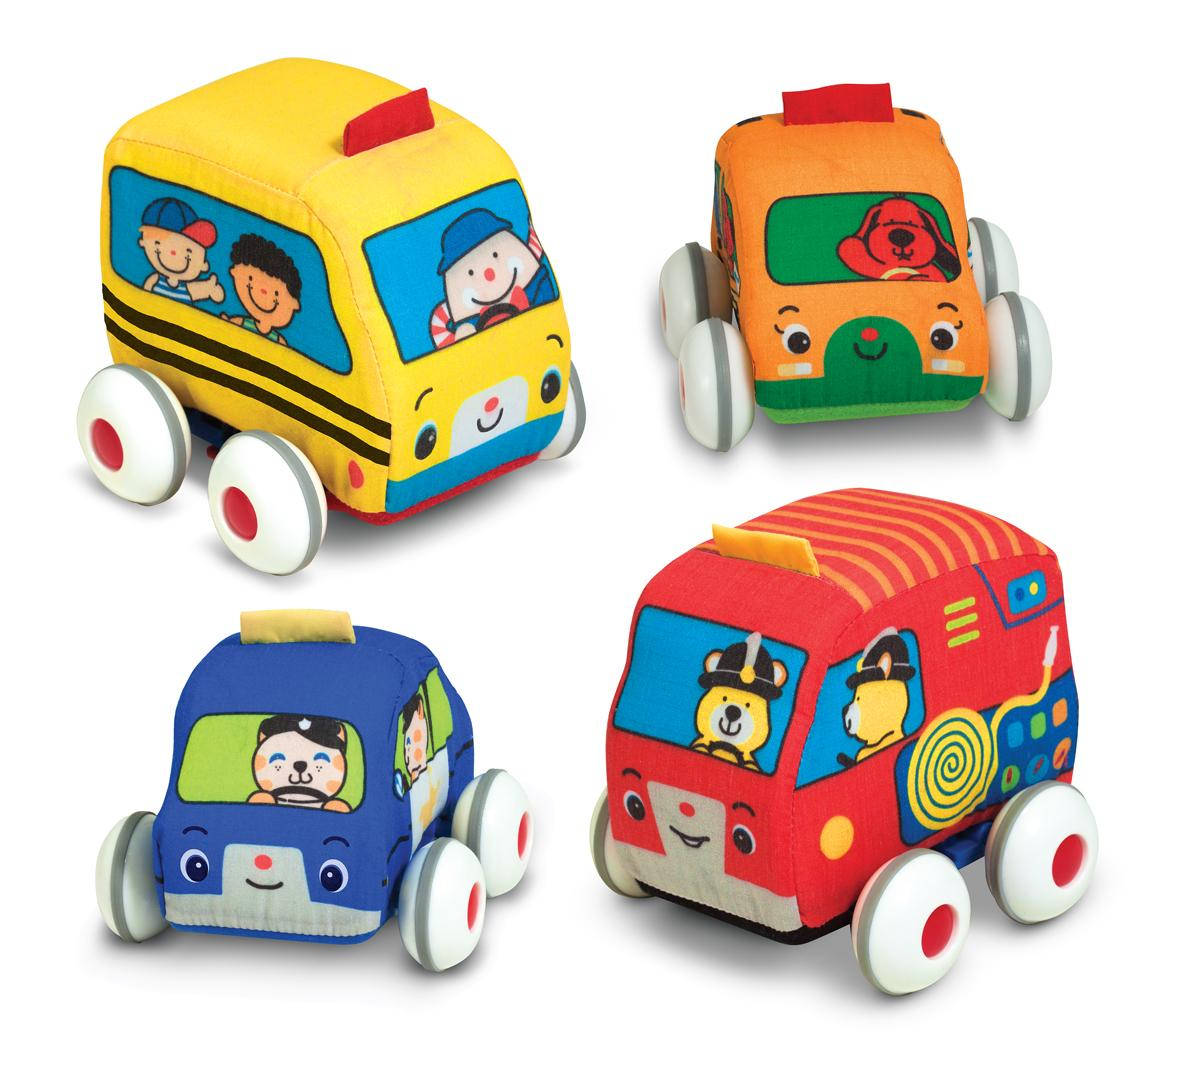 Amazon.com: Melissa & Doug K's Kids Pull-Back Vehicle Set: Melissa